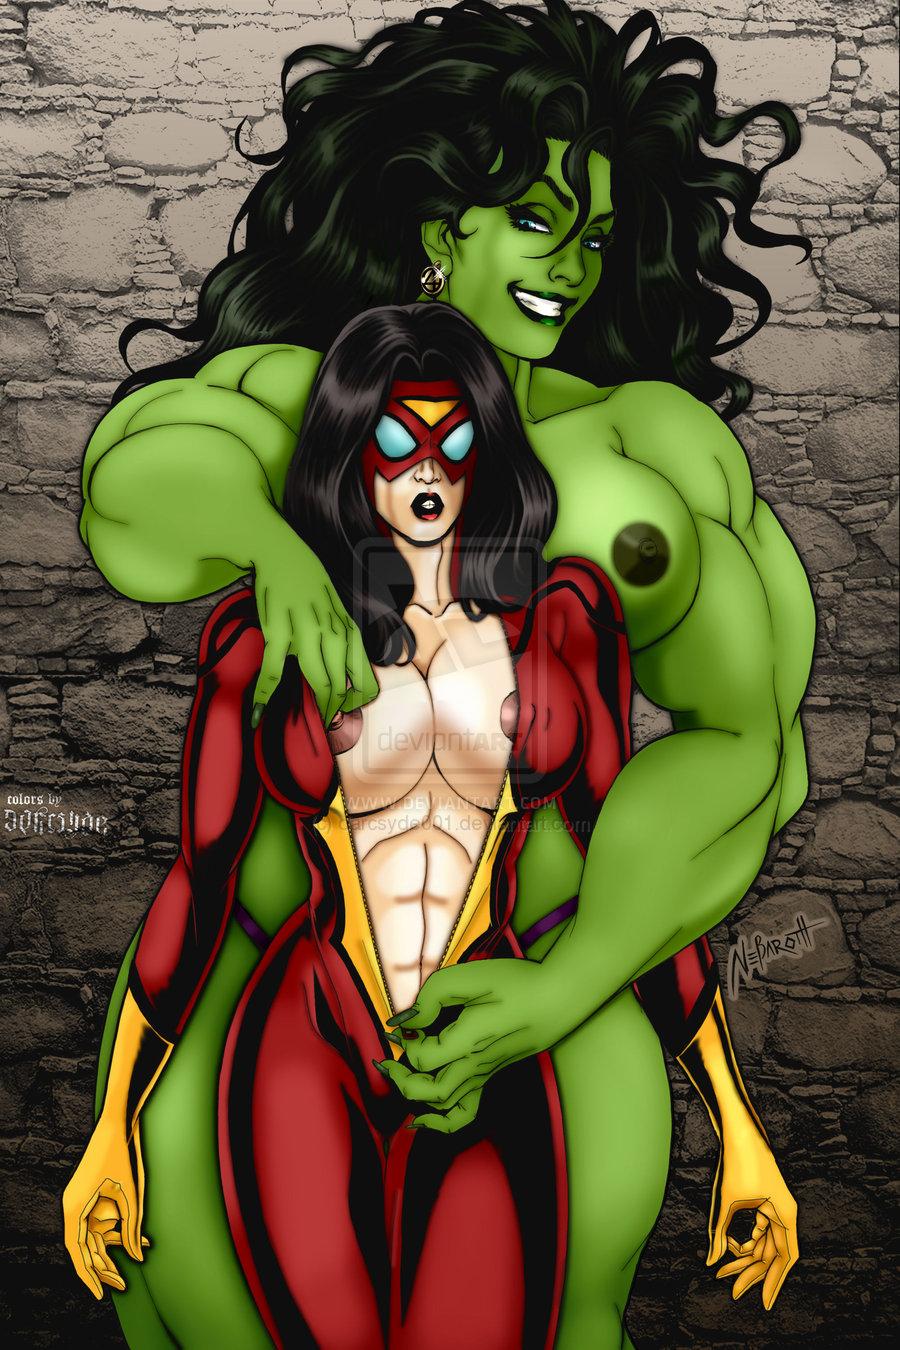 Hulk and she hulk porn